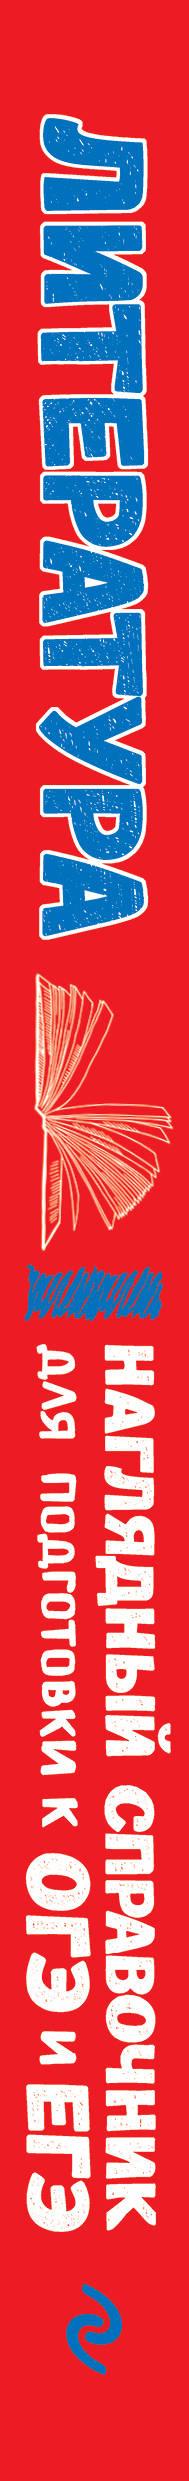 Литература. Титов Вячеслав Александрович; Маланка Татьяна Григорьевна; Насрутдинова Лилия Харисовна